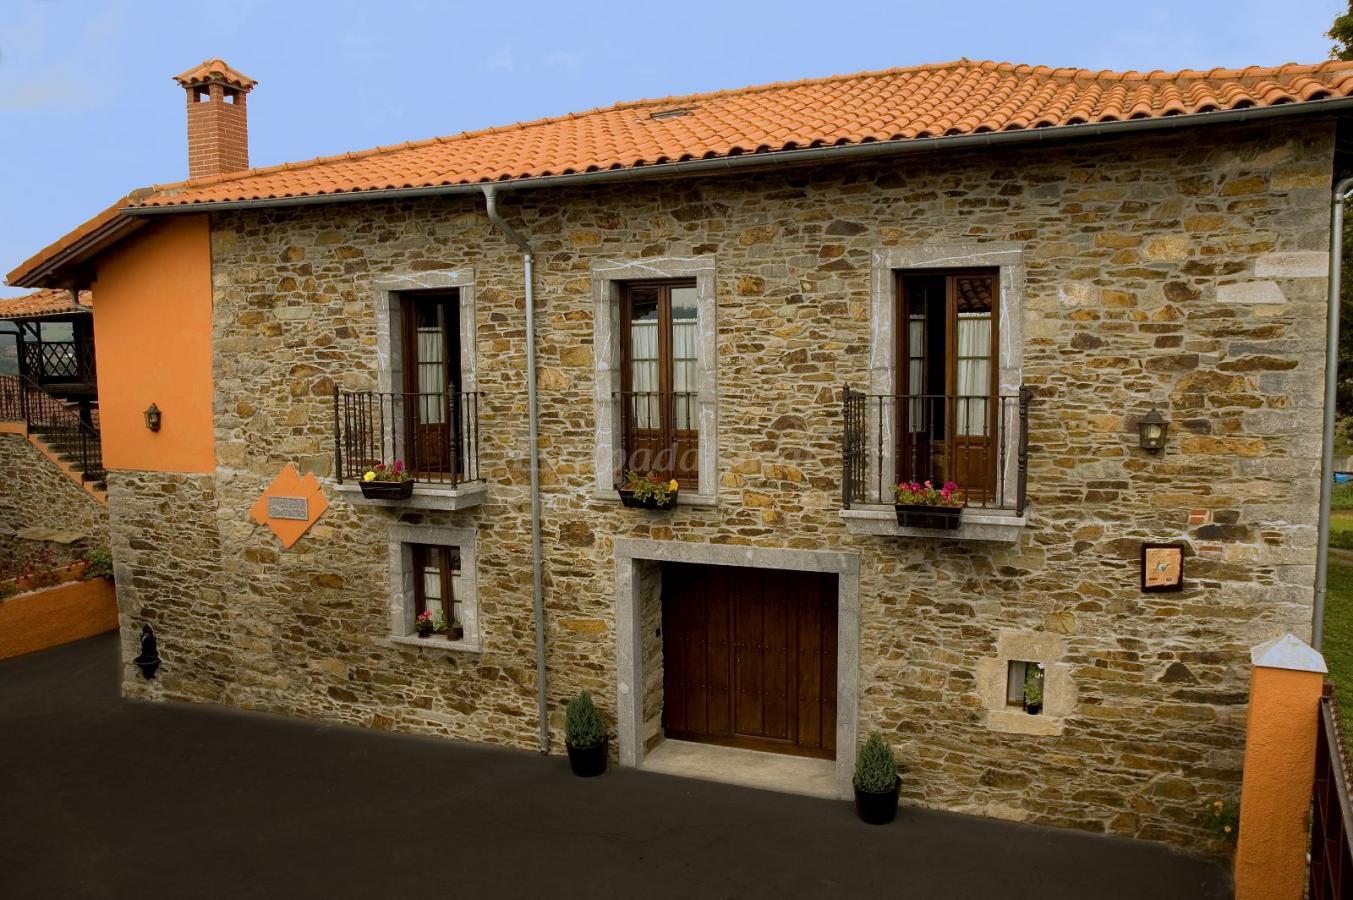 Fotos de el piconeiro casa rural en pravia asturias - Casa rural pravia ...